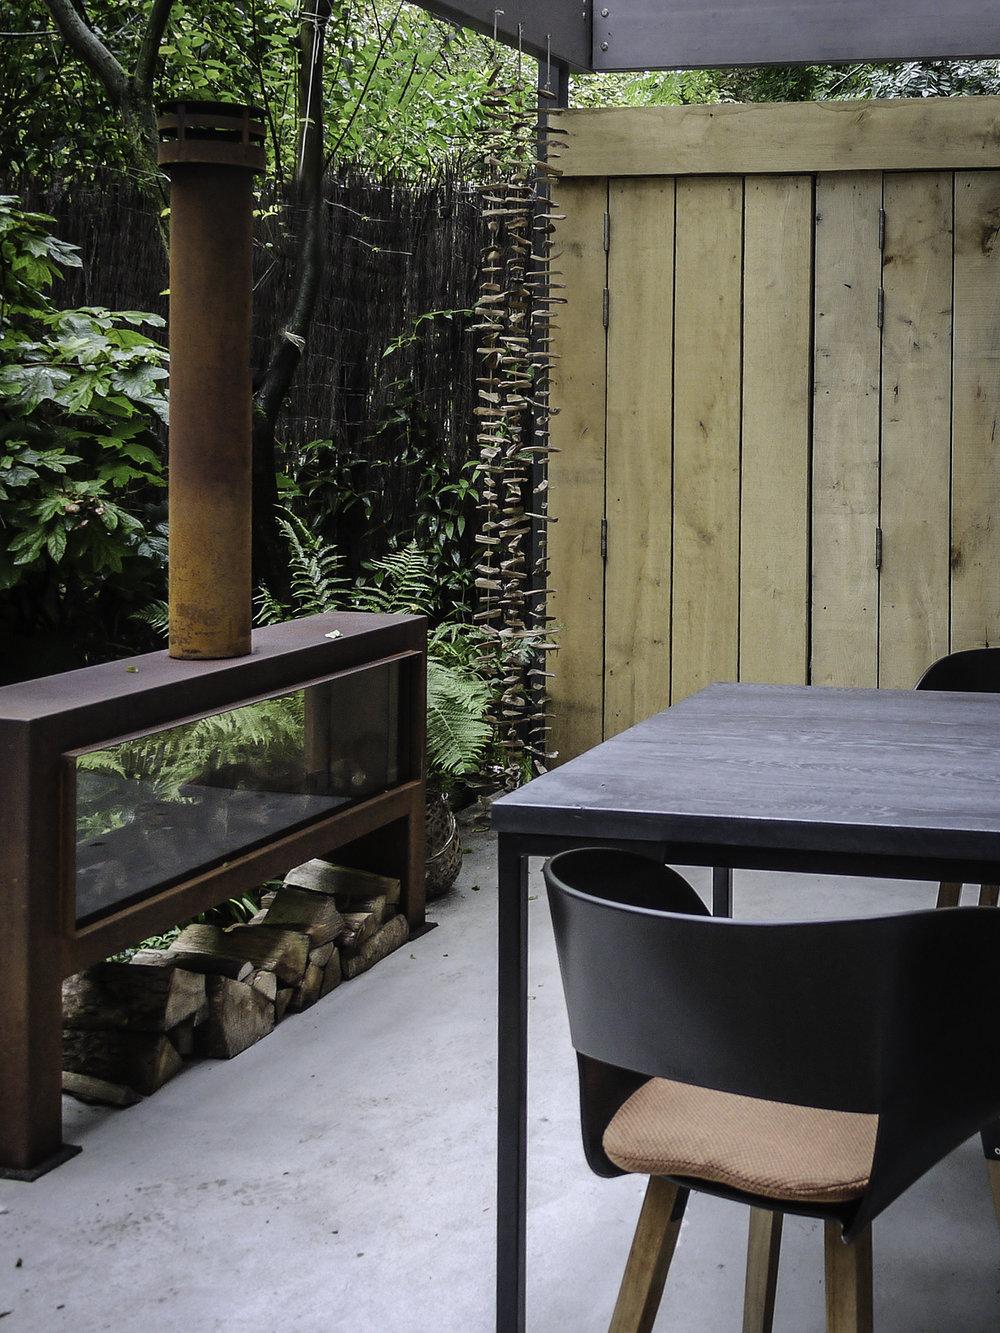 Tuinontwerp Amsterdam met veranda